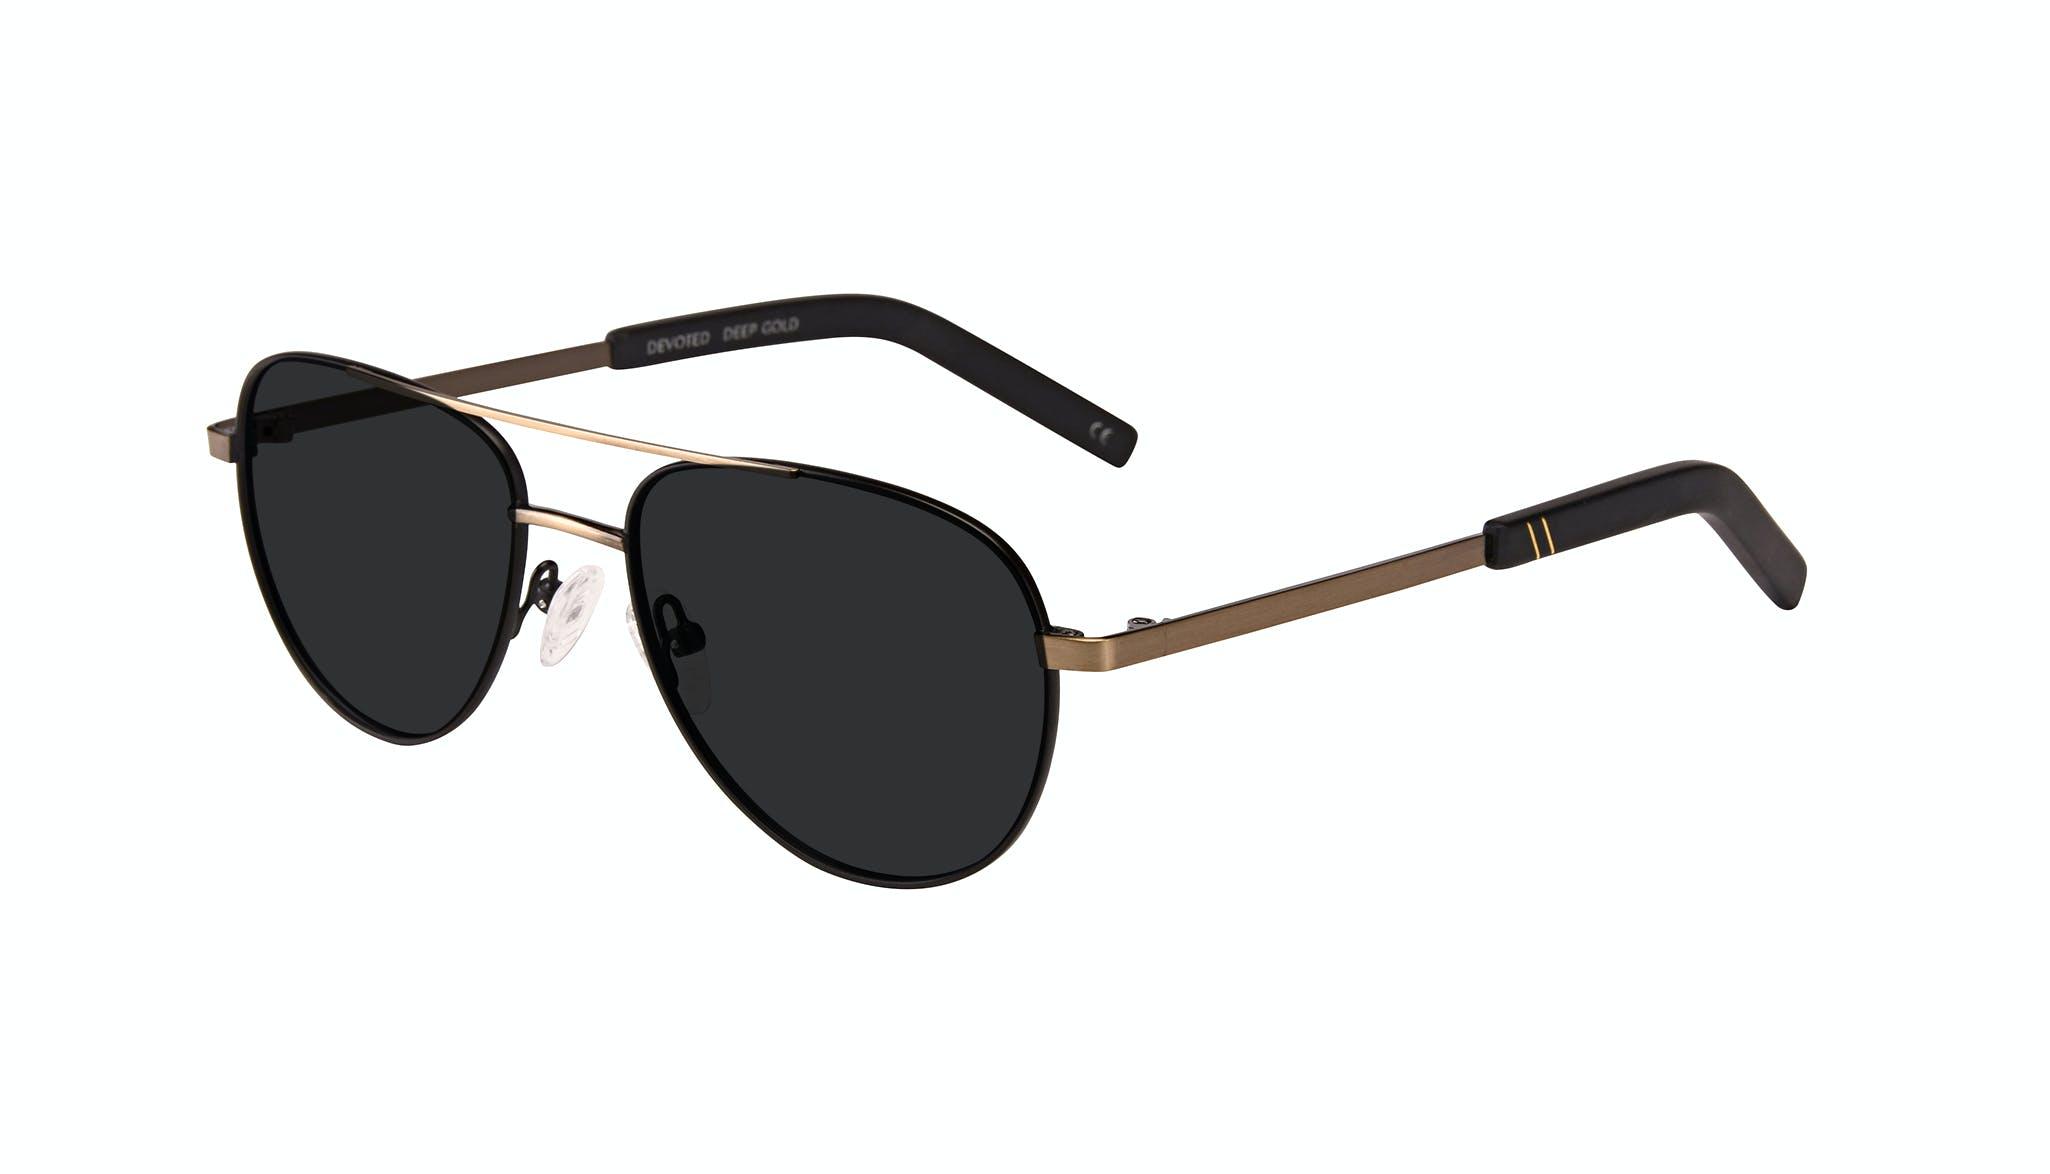 Affordable Fashion Glasses Aviator Sunglasses Men Devoted Deep Gold Tilt